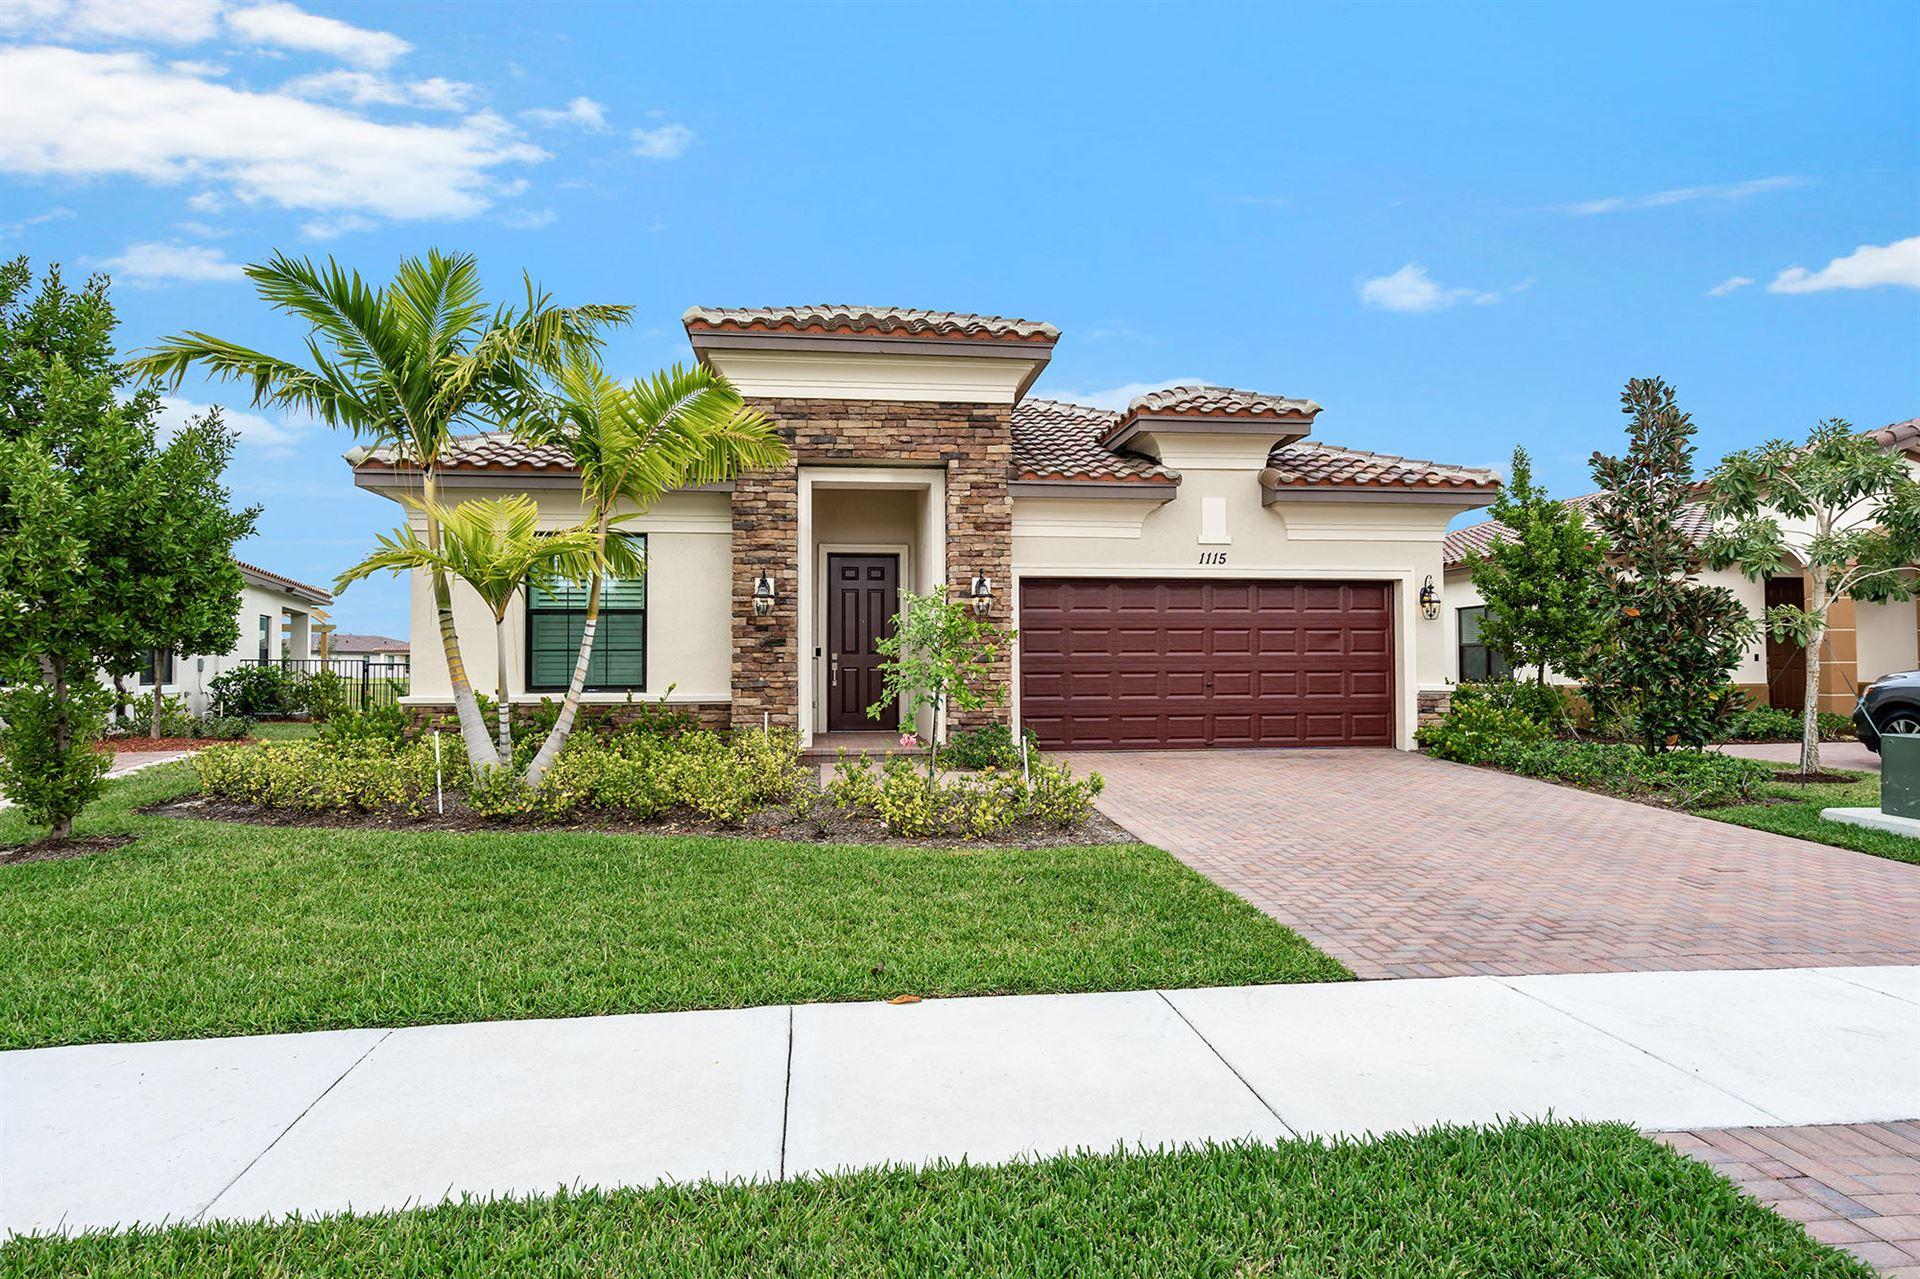 1115 Brinely Place, Royal Palm Beach, FL 33411 - #: RX-10593659